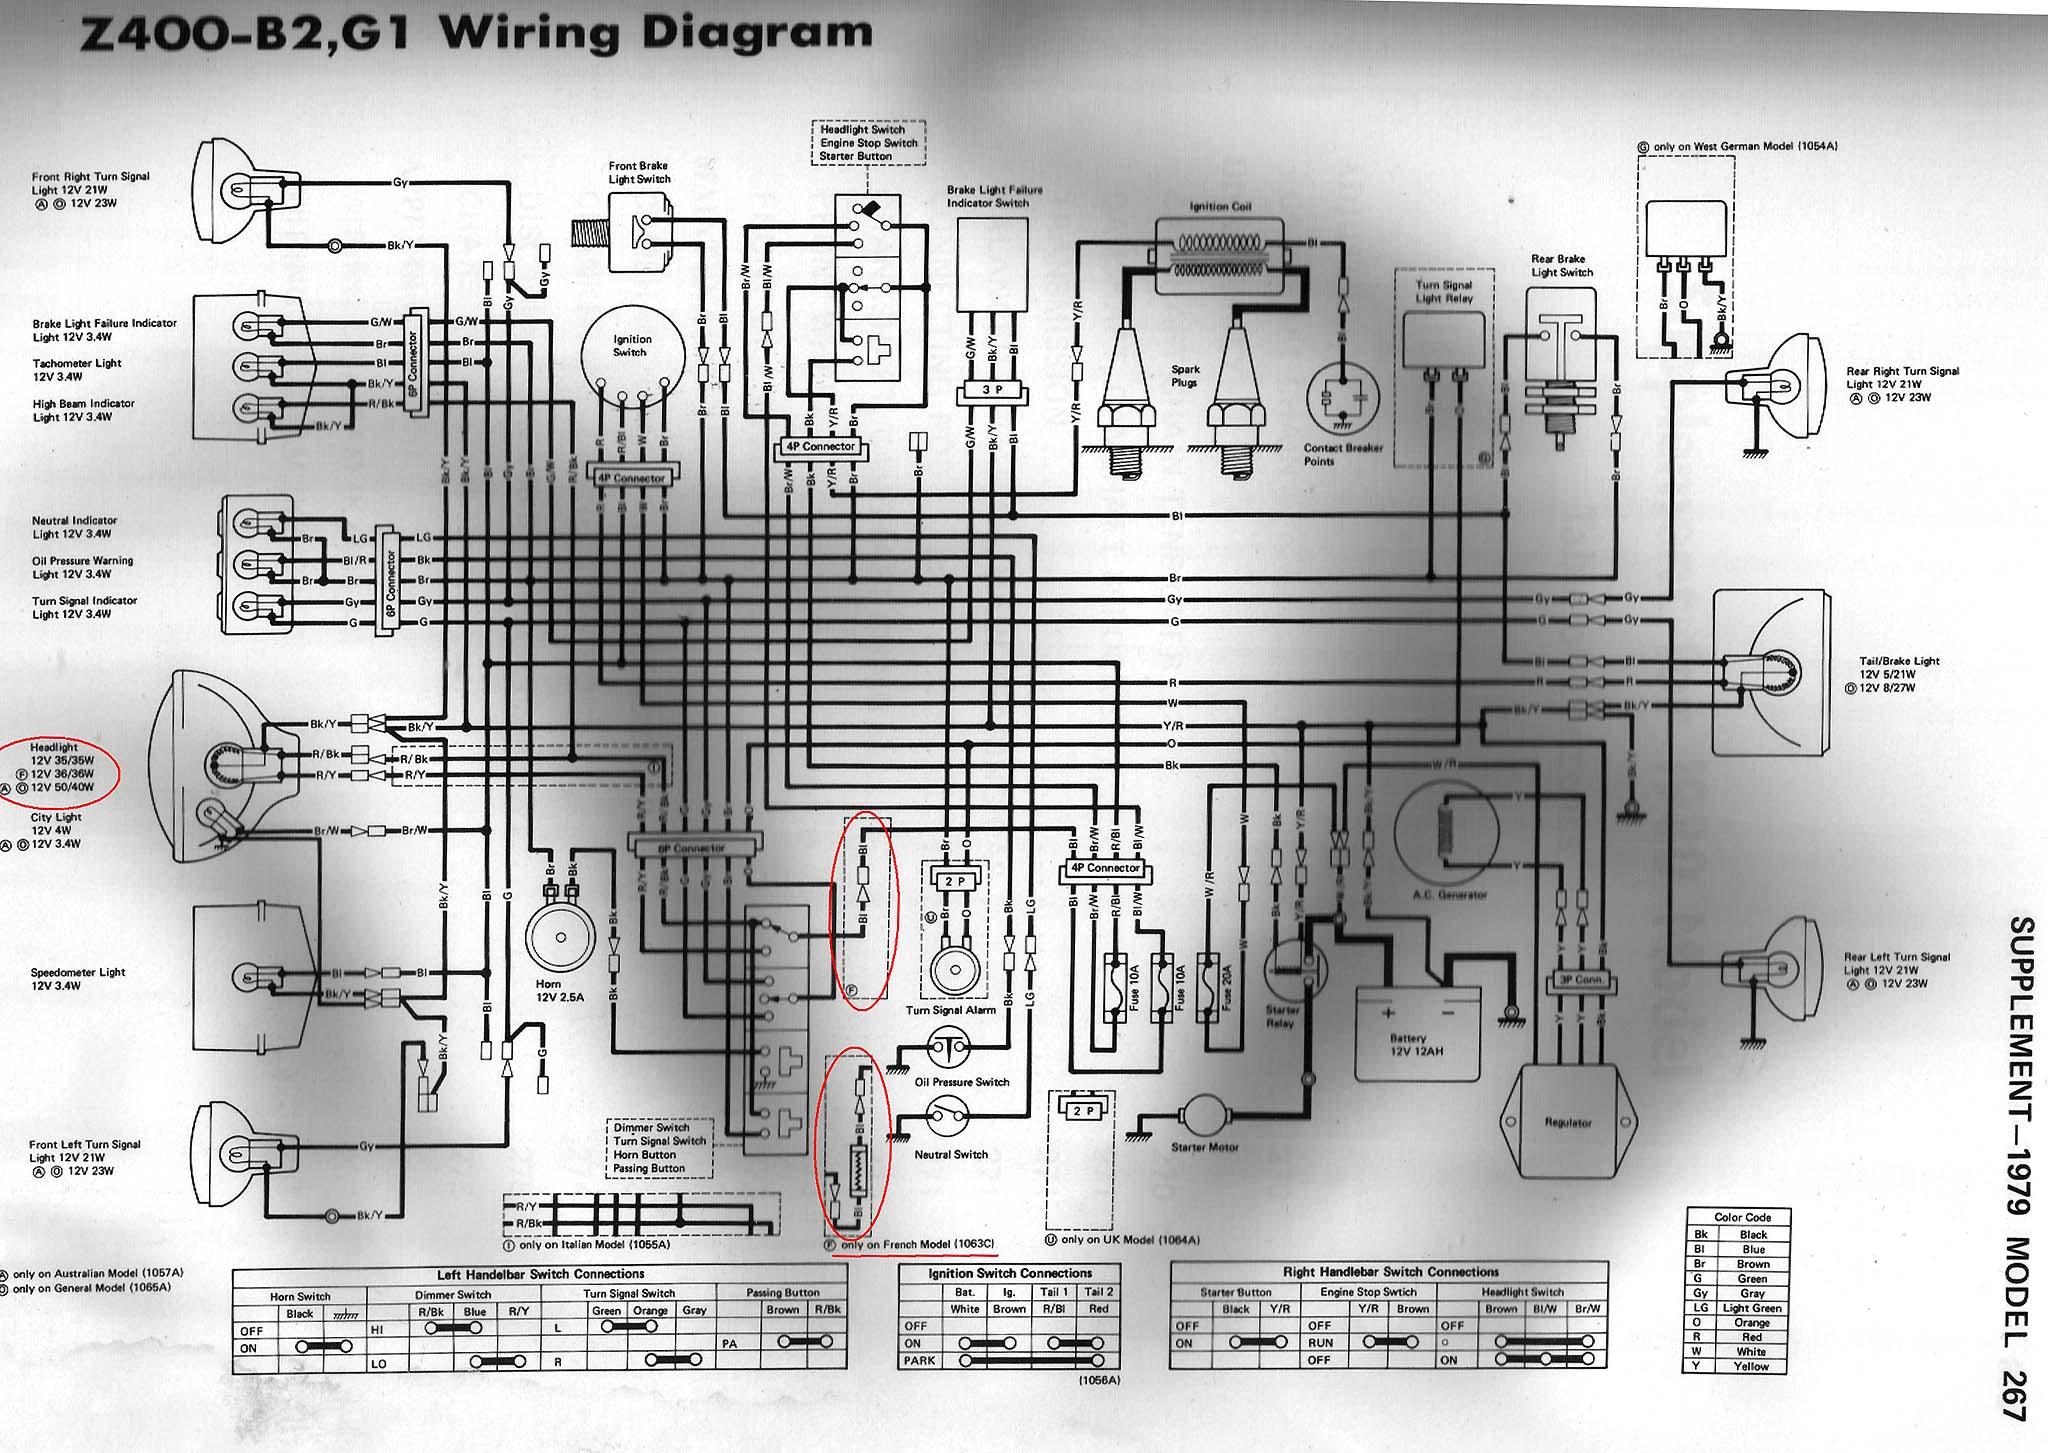 k z 400 wiring diagram manual e books Electrical Wiring index of techh tips bilder wiring diagrams k z 400